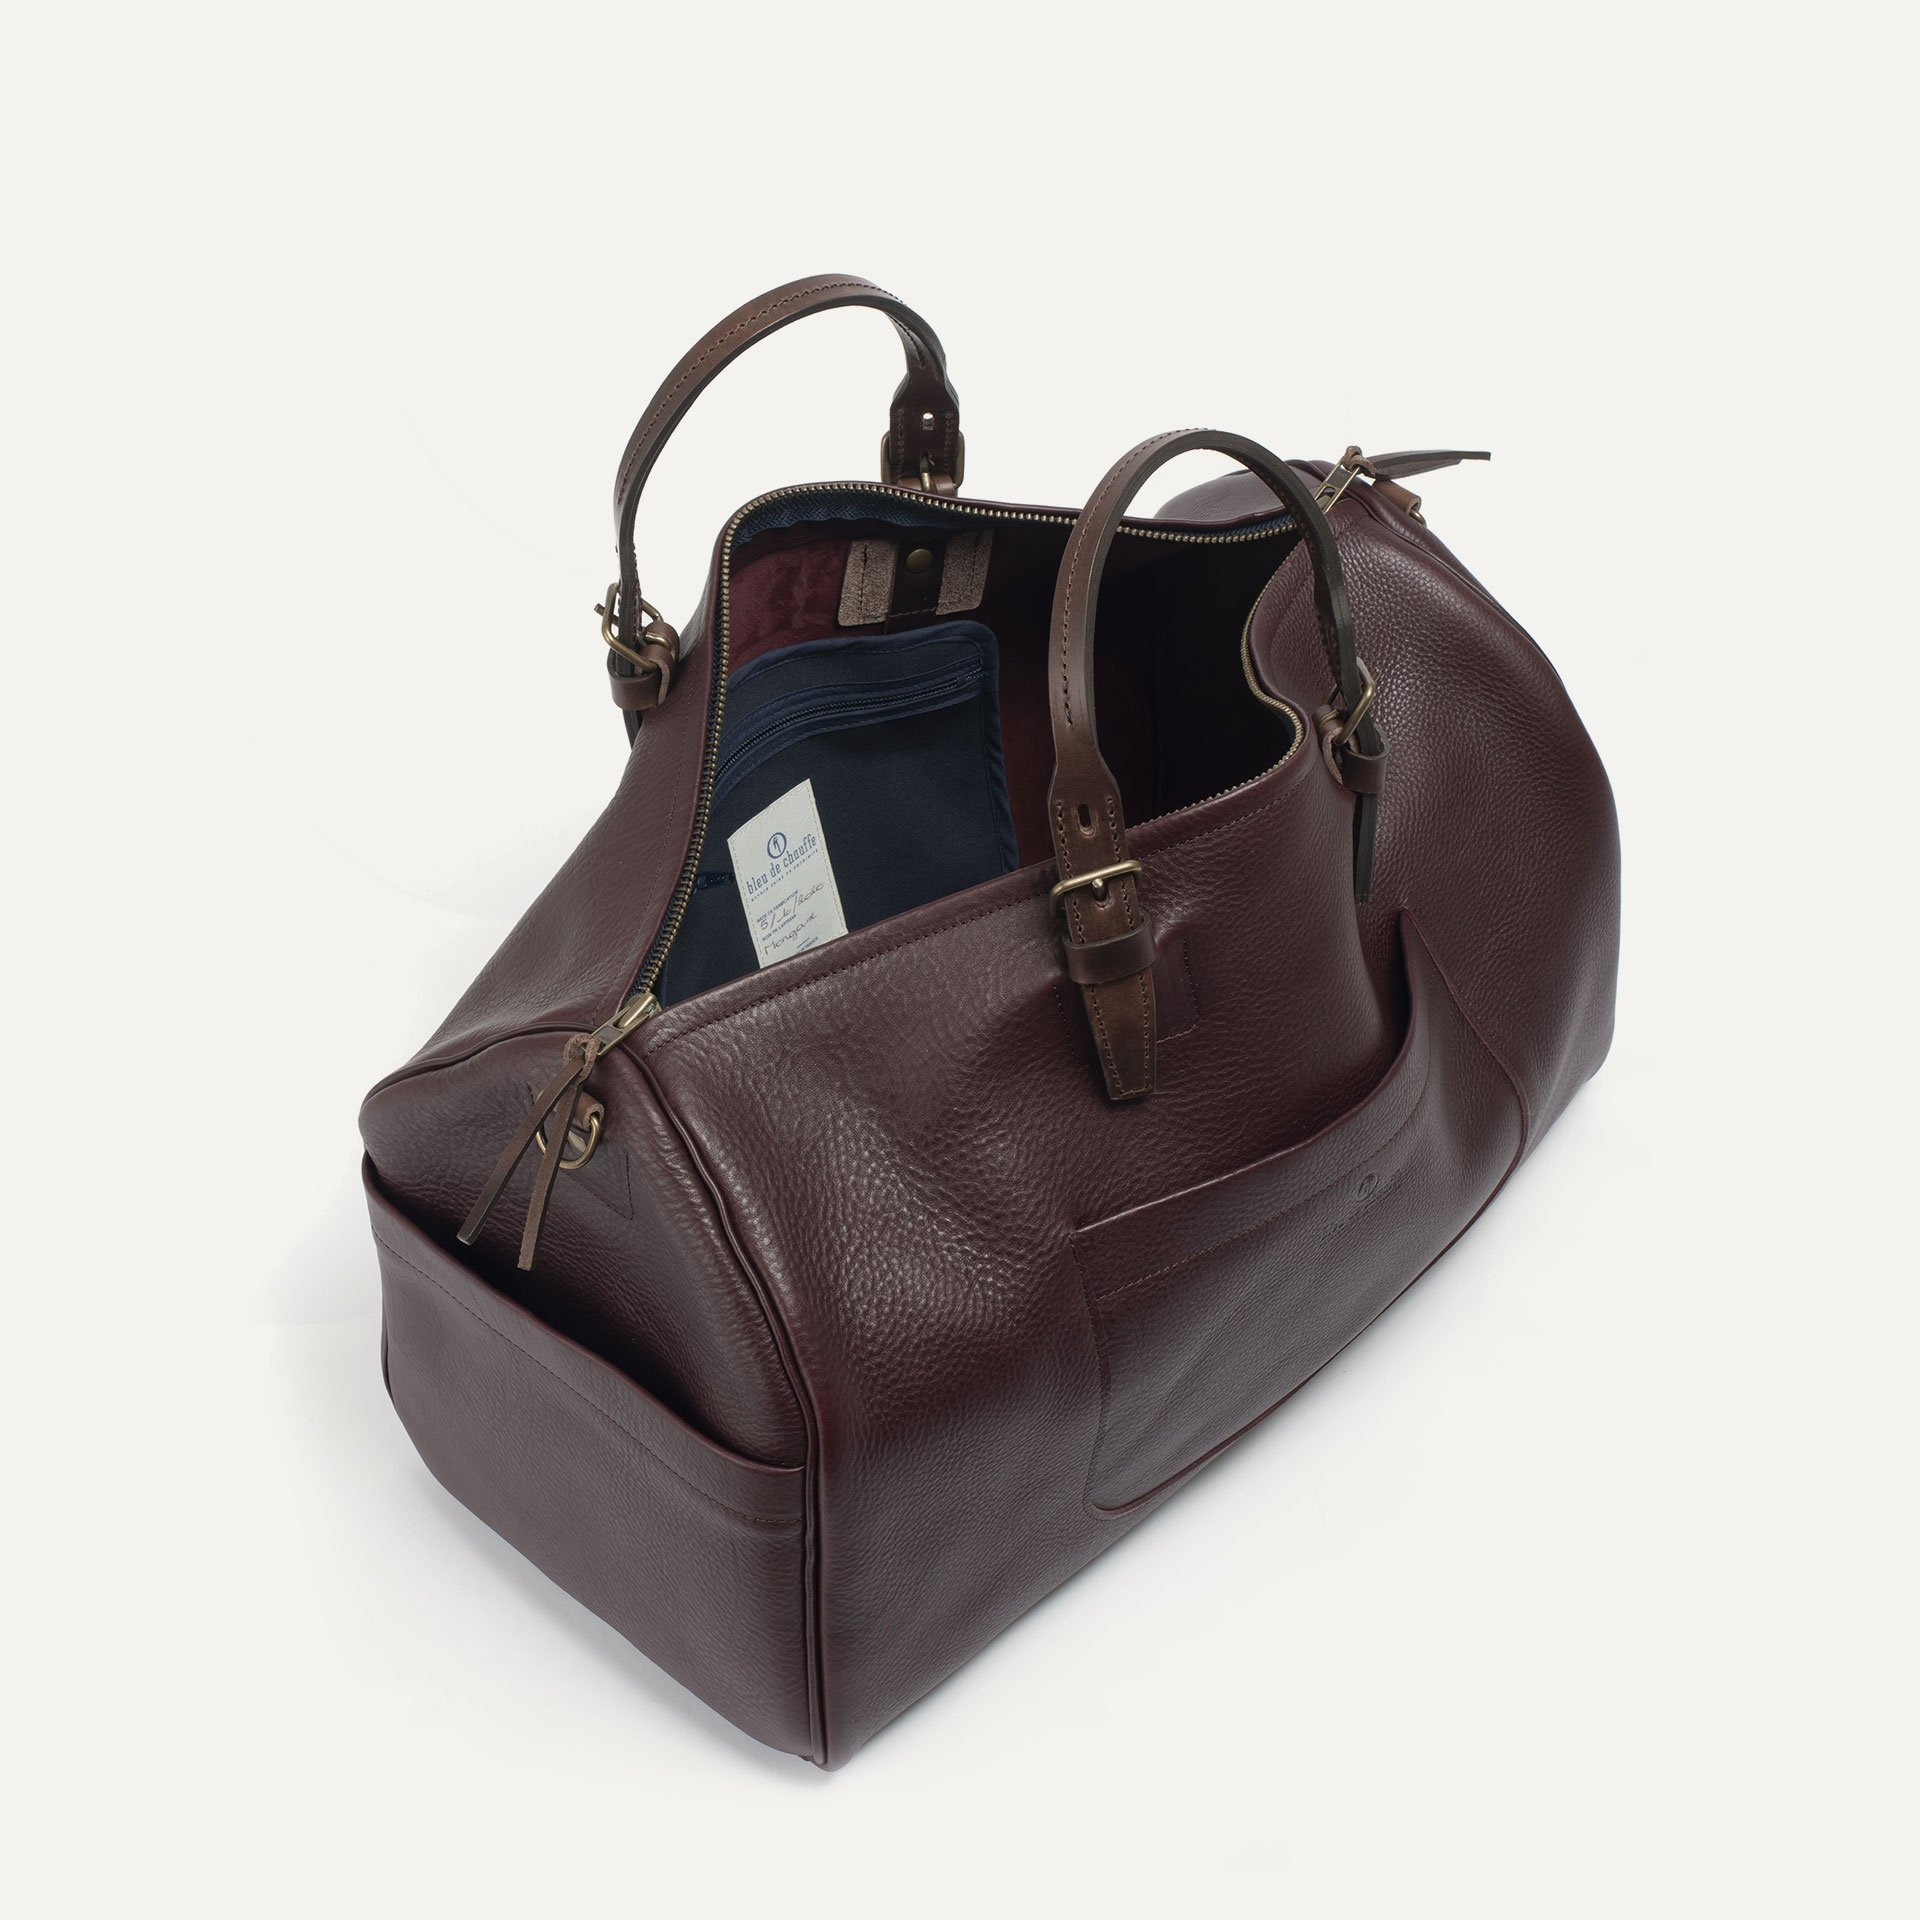 Hobo Travel bag - Peat (image n°4)